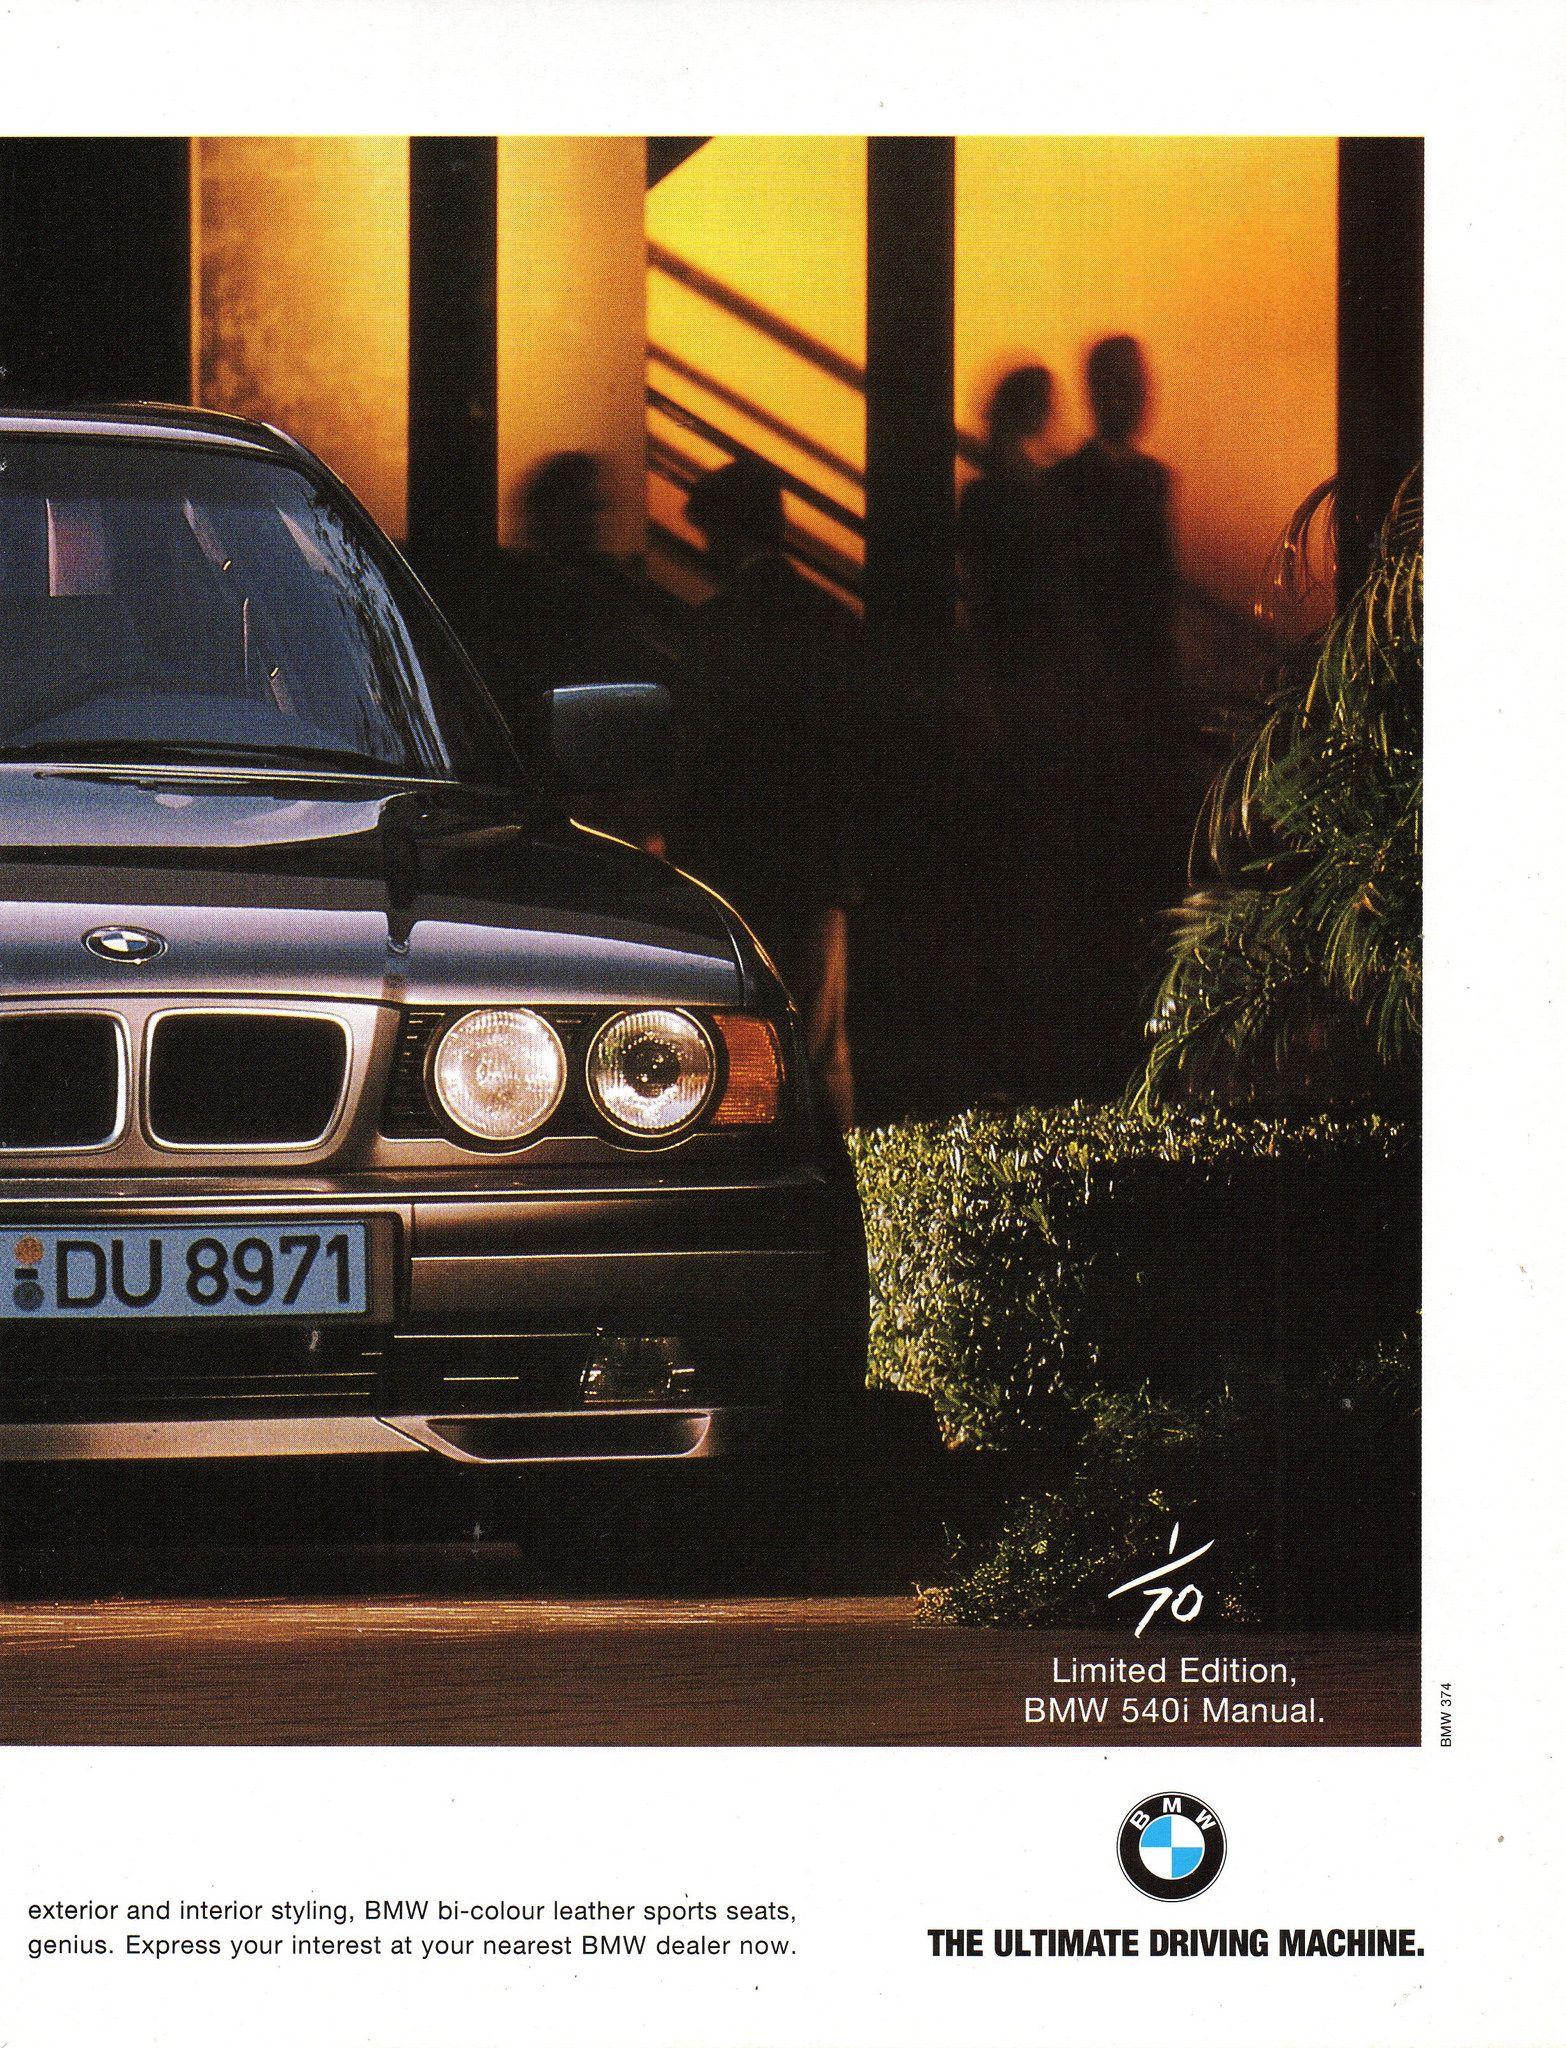 1995 Bmw 540i Manual Sedan Limited Edition Page 2 Aussie Original Magazine Advertisement Bmw Vintage Bmw E34 Bmw Motors